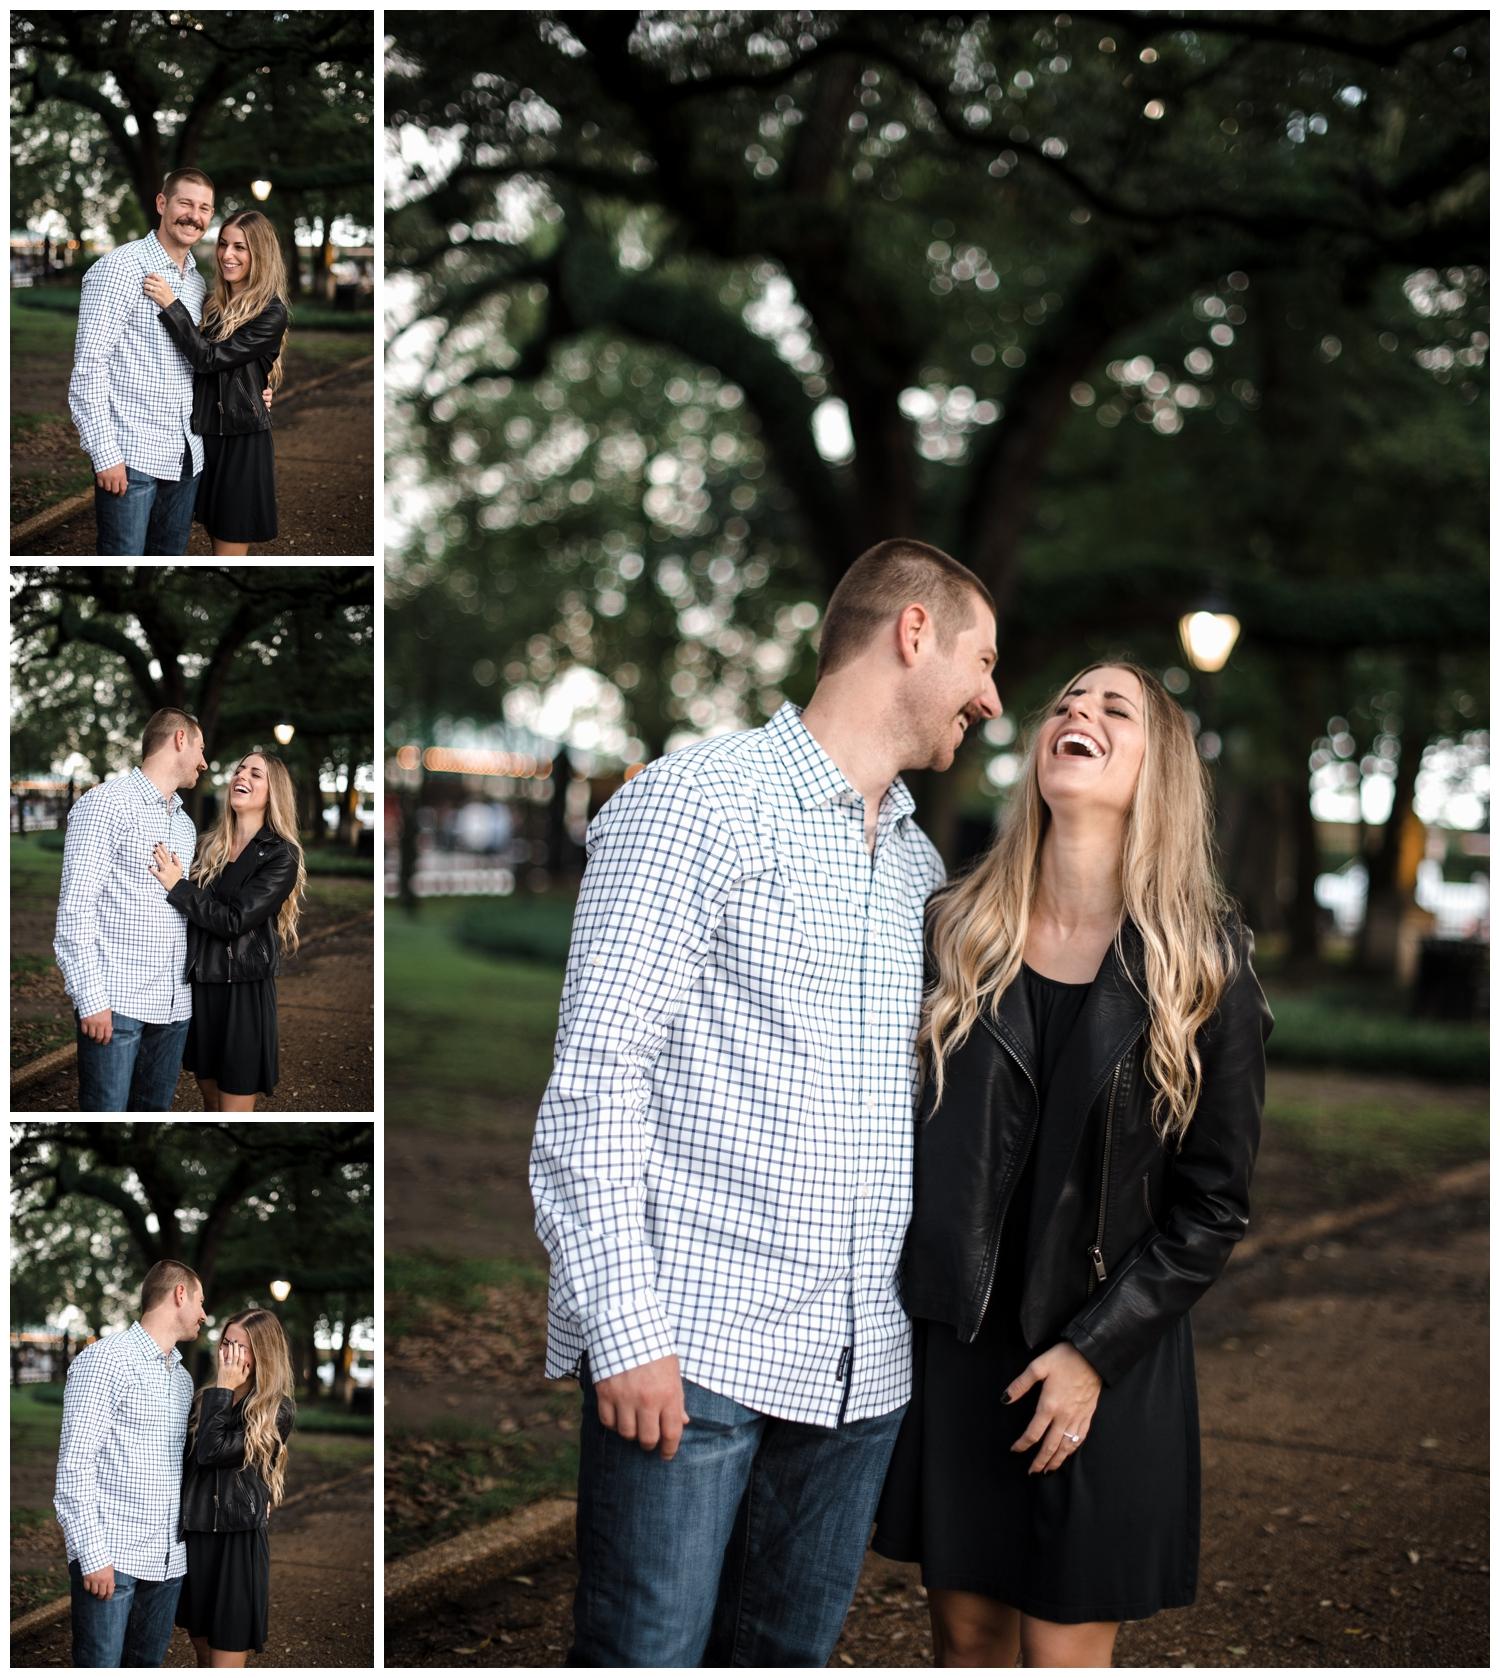 New-Orleans-Engagement-photos- French-Quarter-Proposal-New-Orleans-Photographer- kallistia-photography_0006.jpg